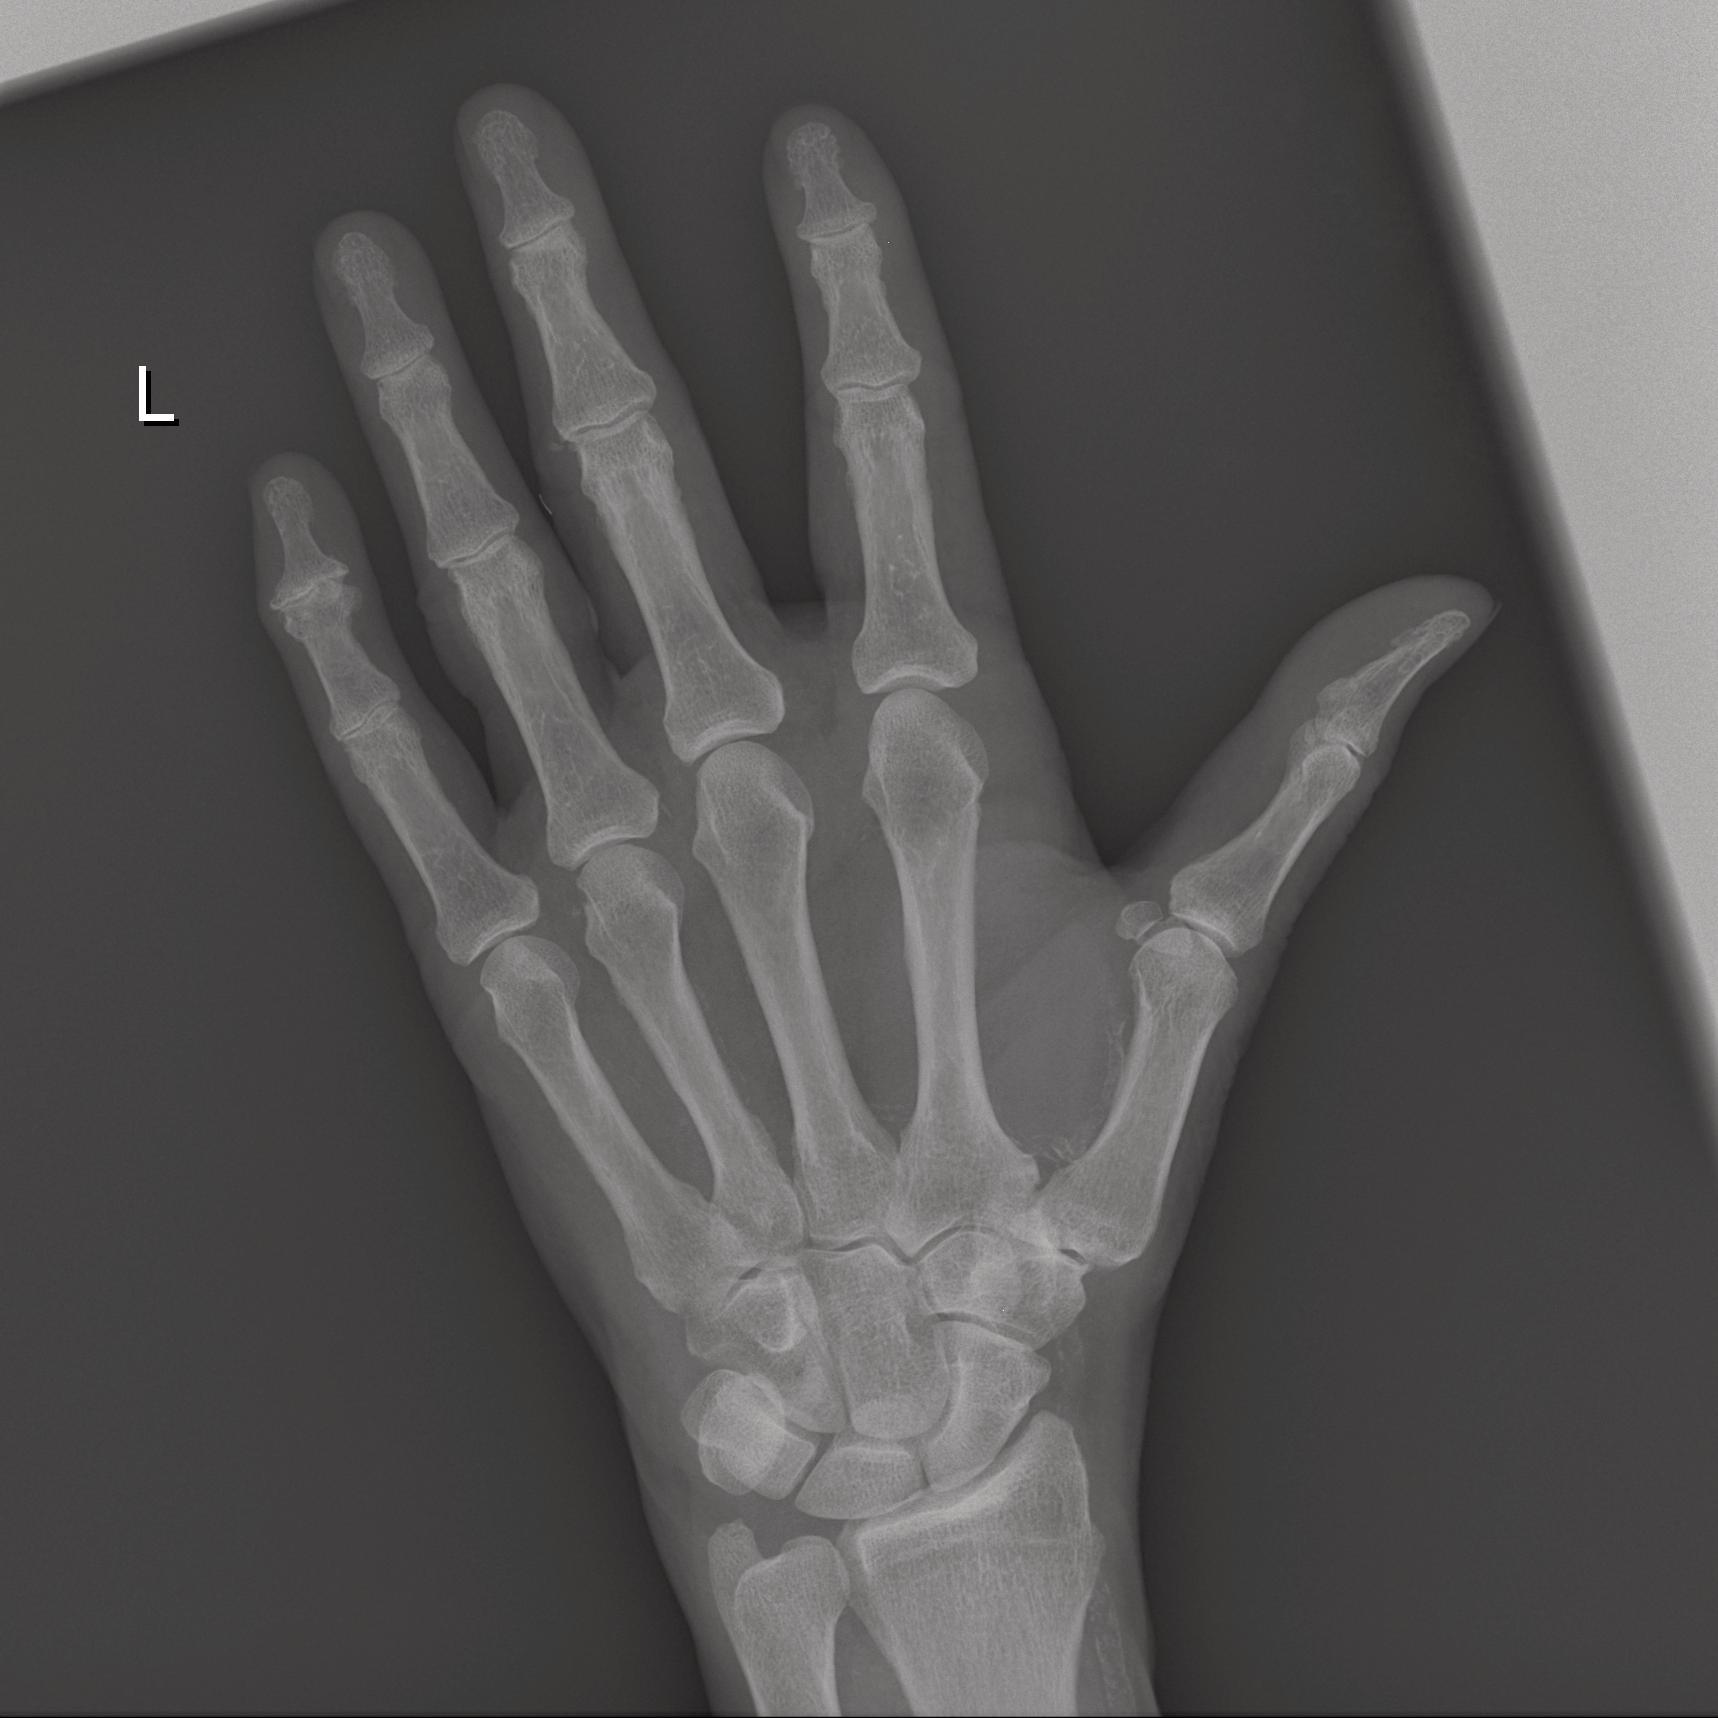 Mira wiD, Hand, ap